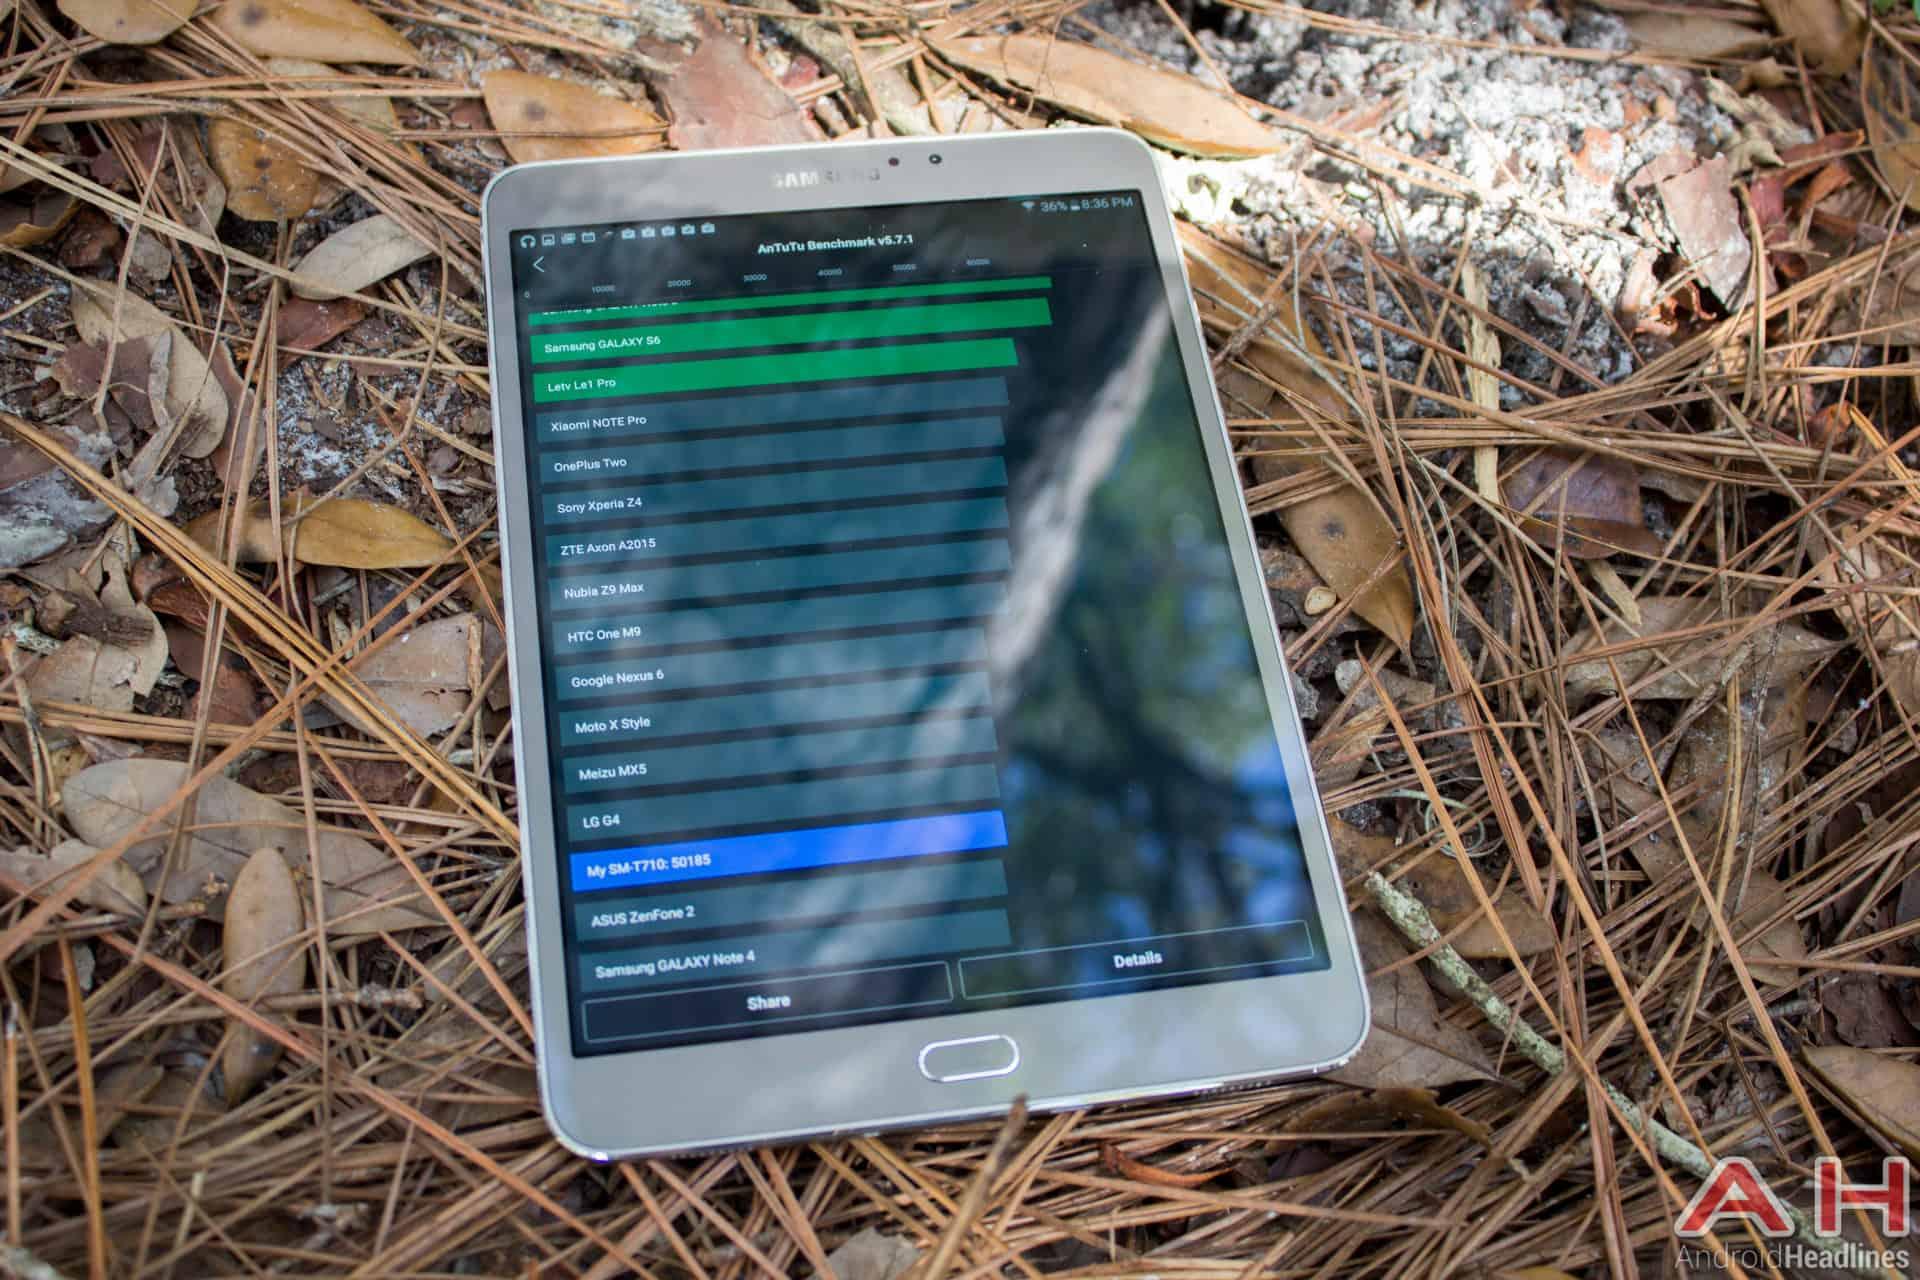 Samsung-Galaxy-Tab-S2-AH-bench